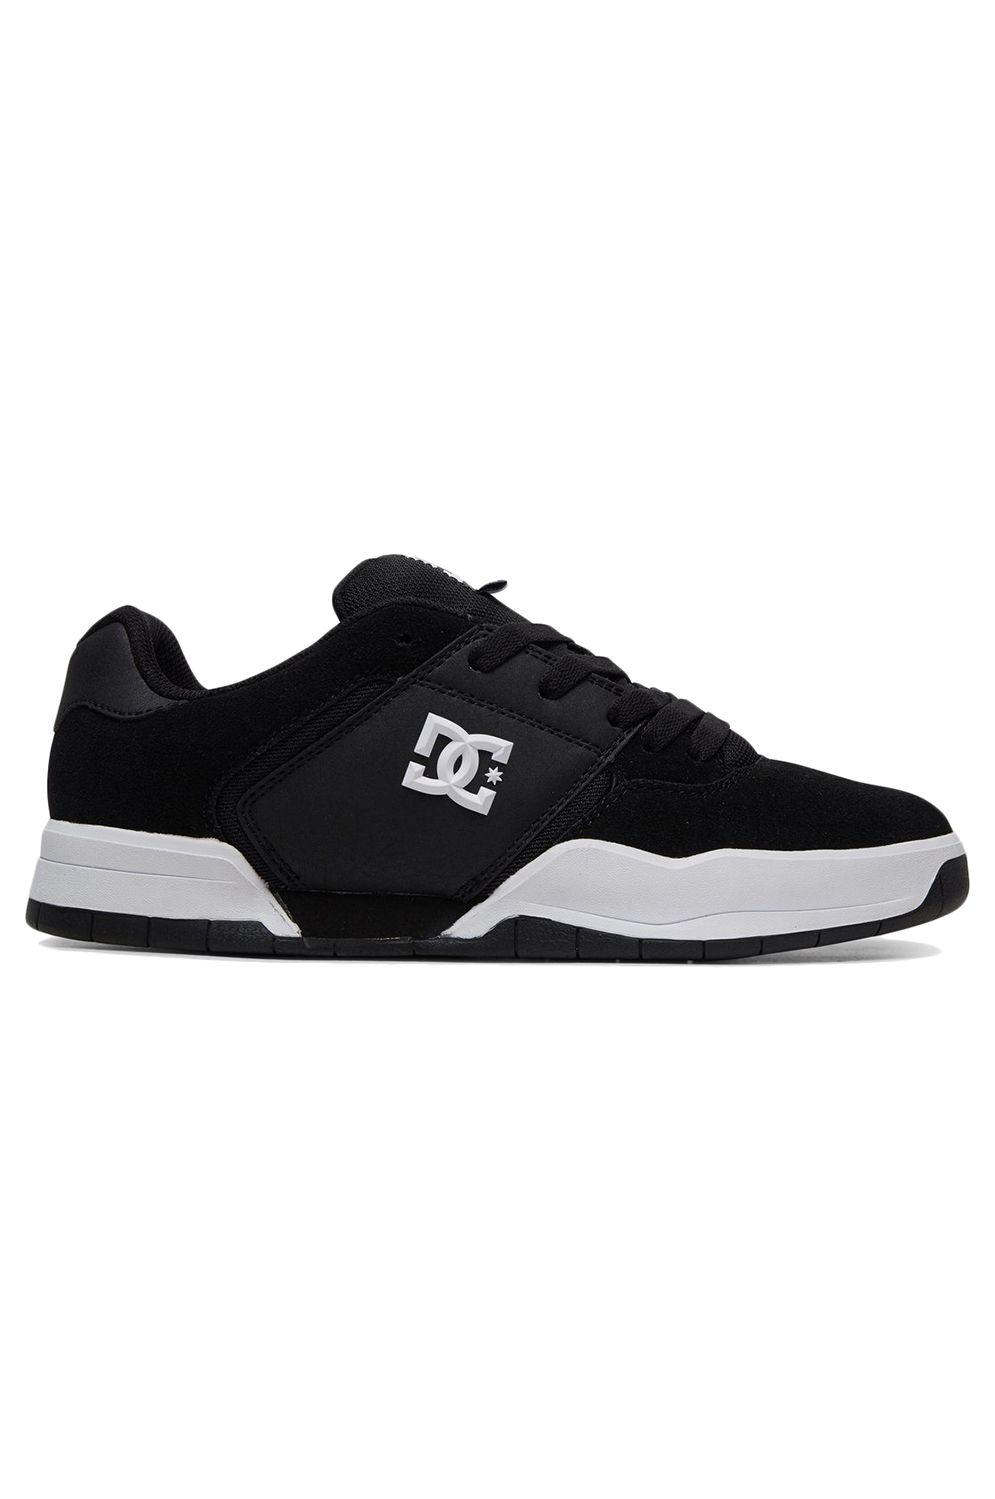 Tenis DC Shoes CENTRAL Black/White